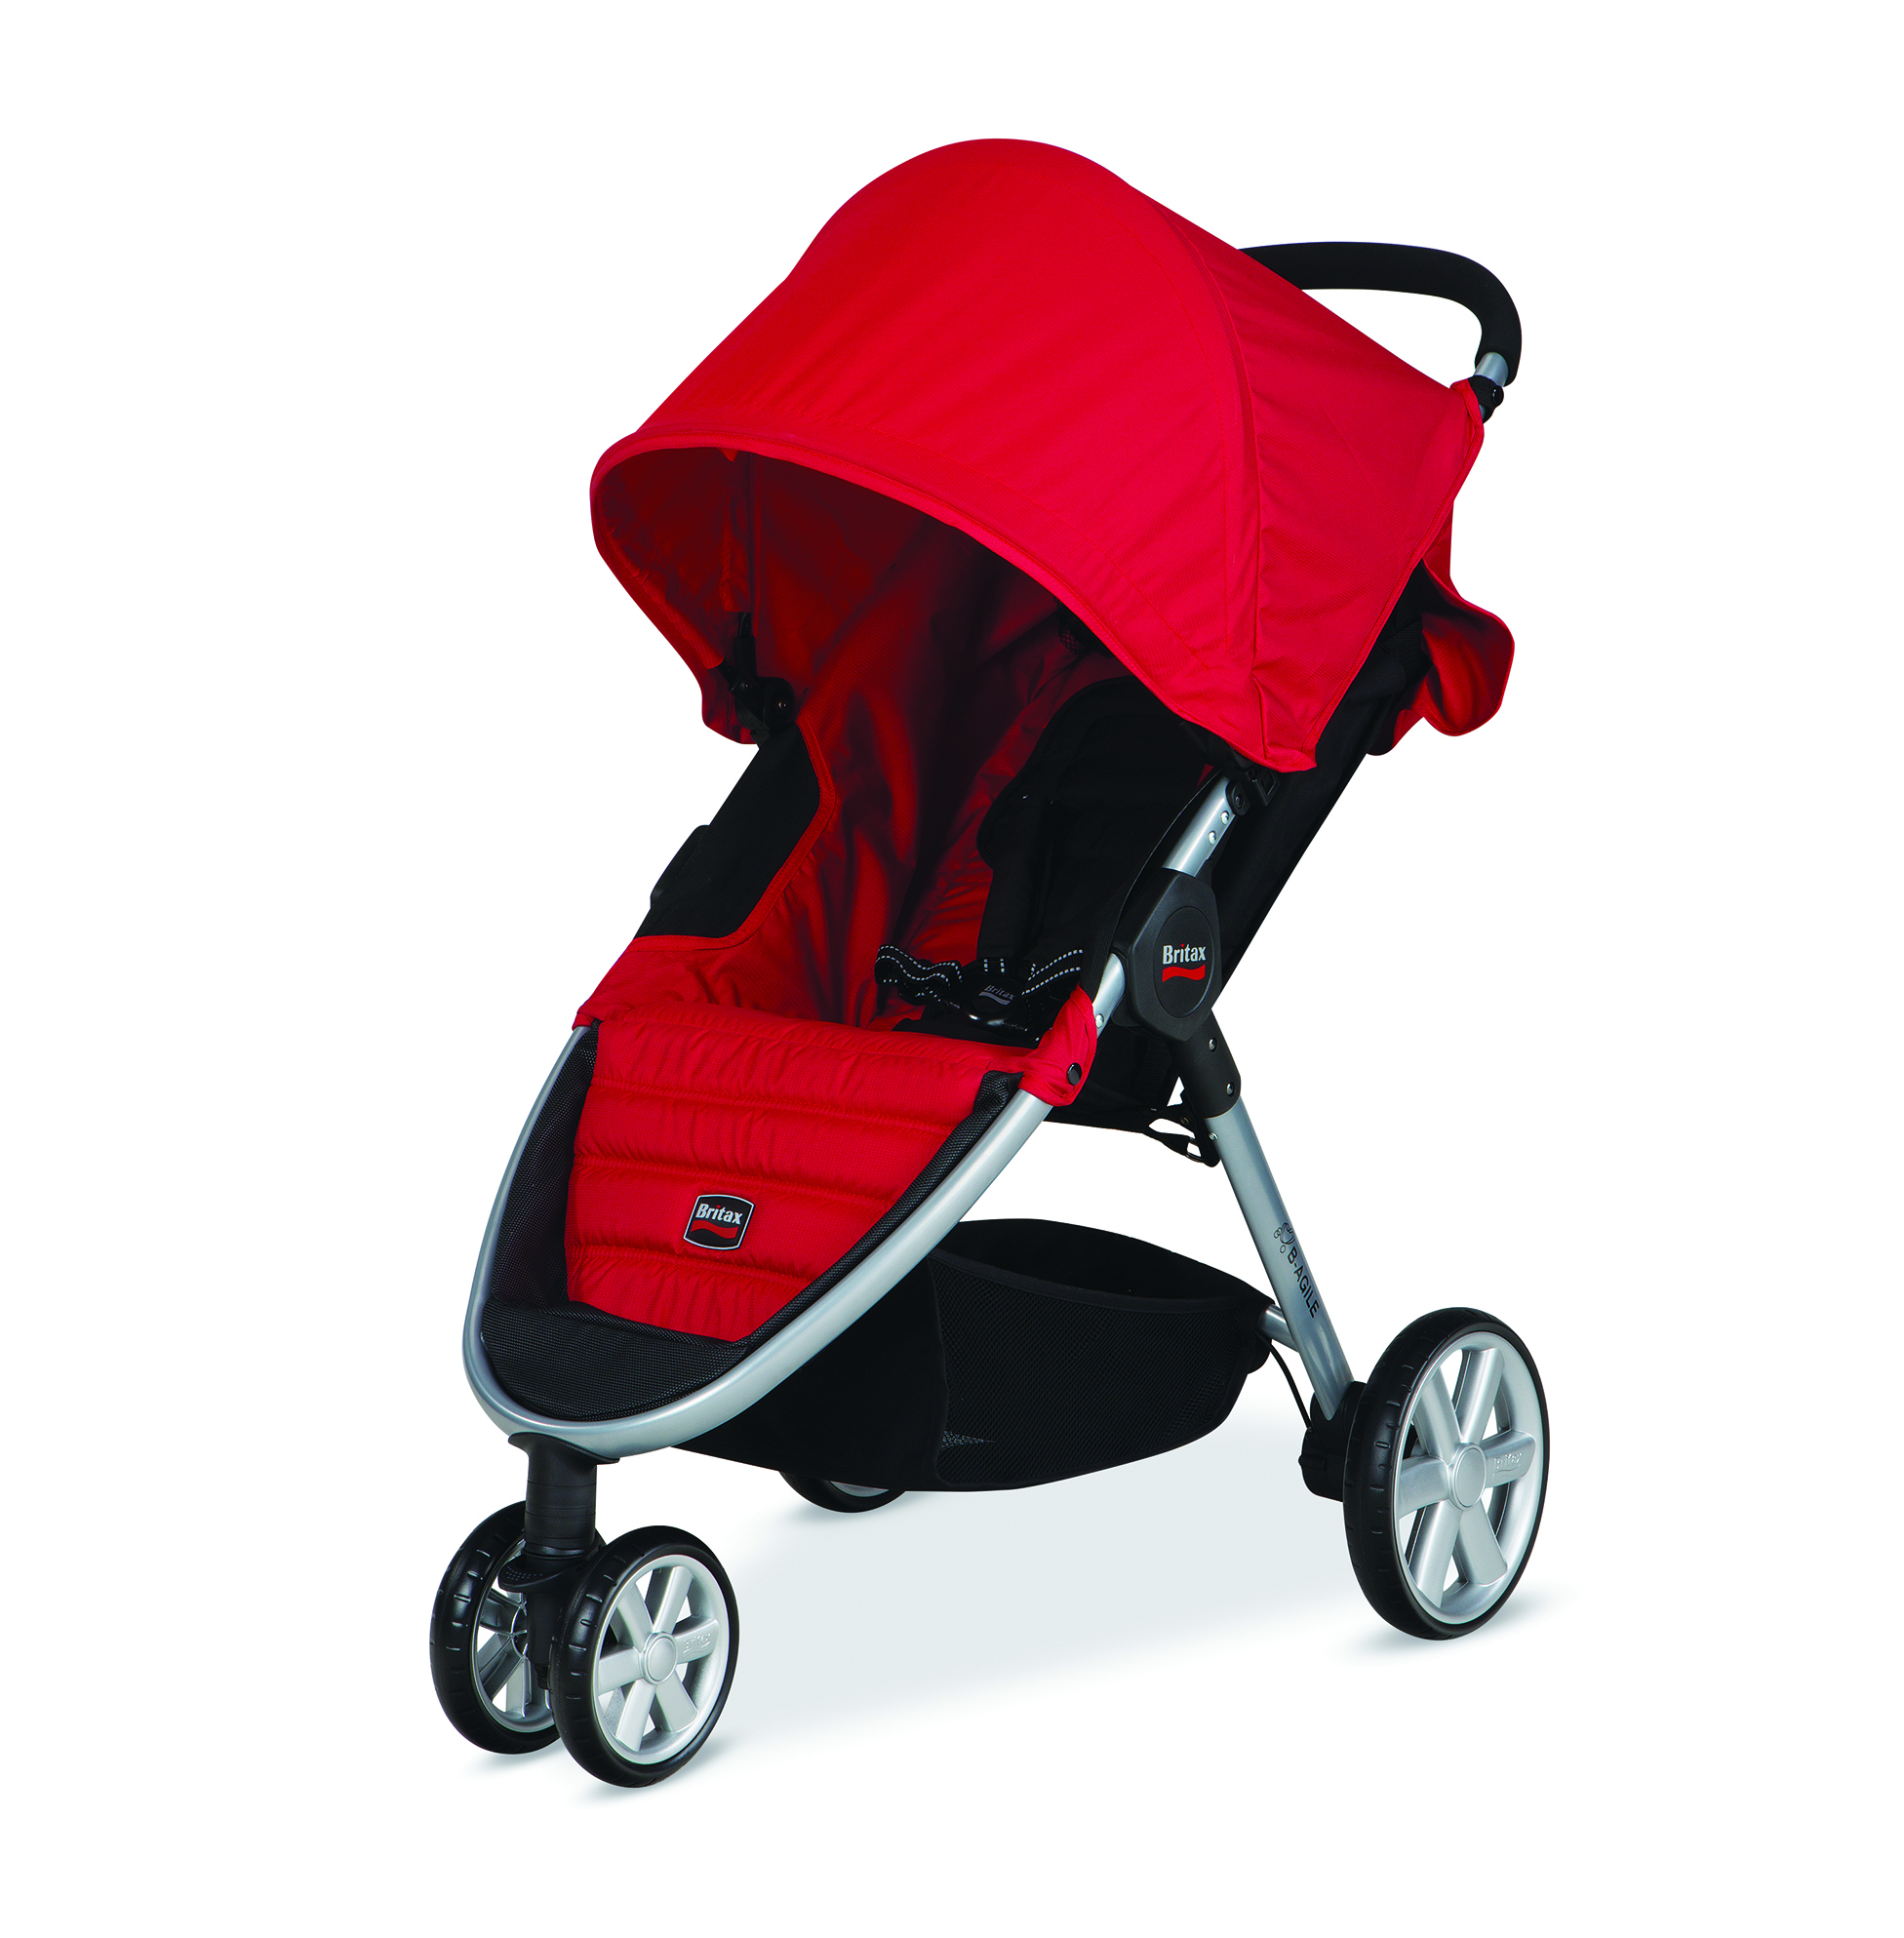 britax 2017 b agile stroller review recommended stroller. Black Bedroom Furniture Sets. Home Design Ideas